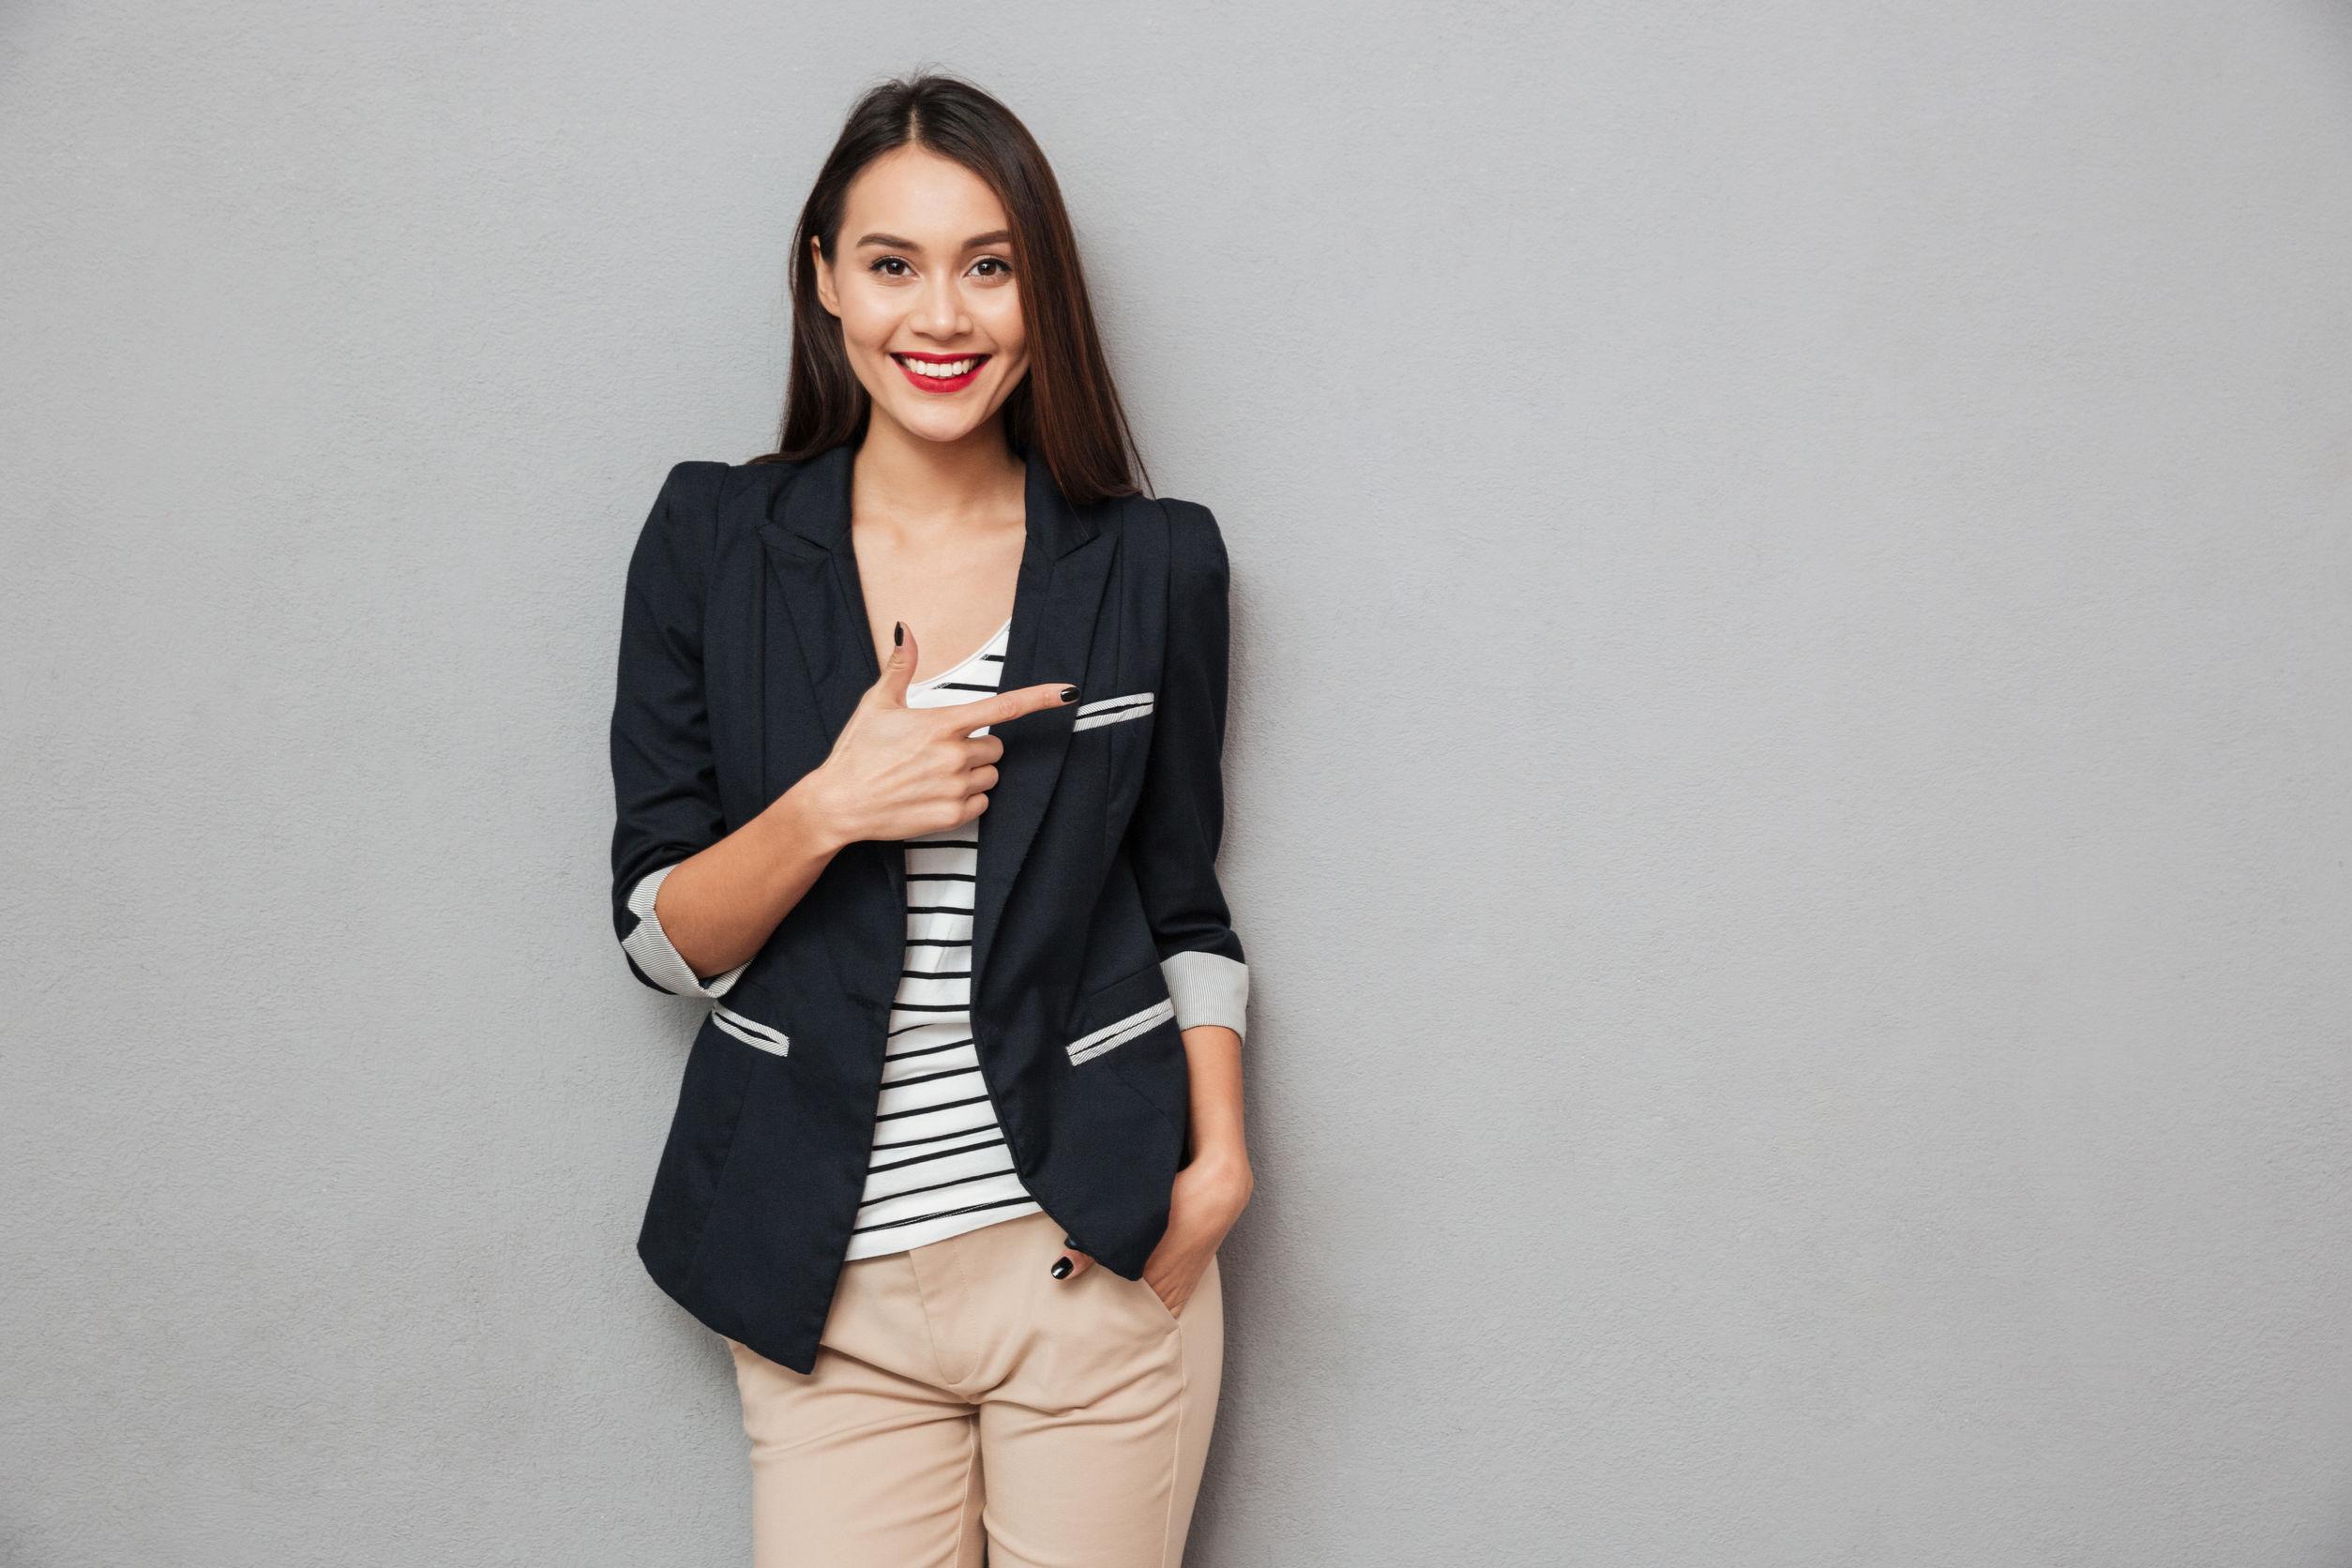 Beginilah Proses Gadai Ijazah Citibank Kredit